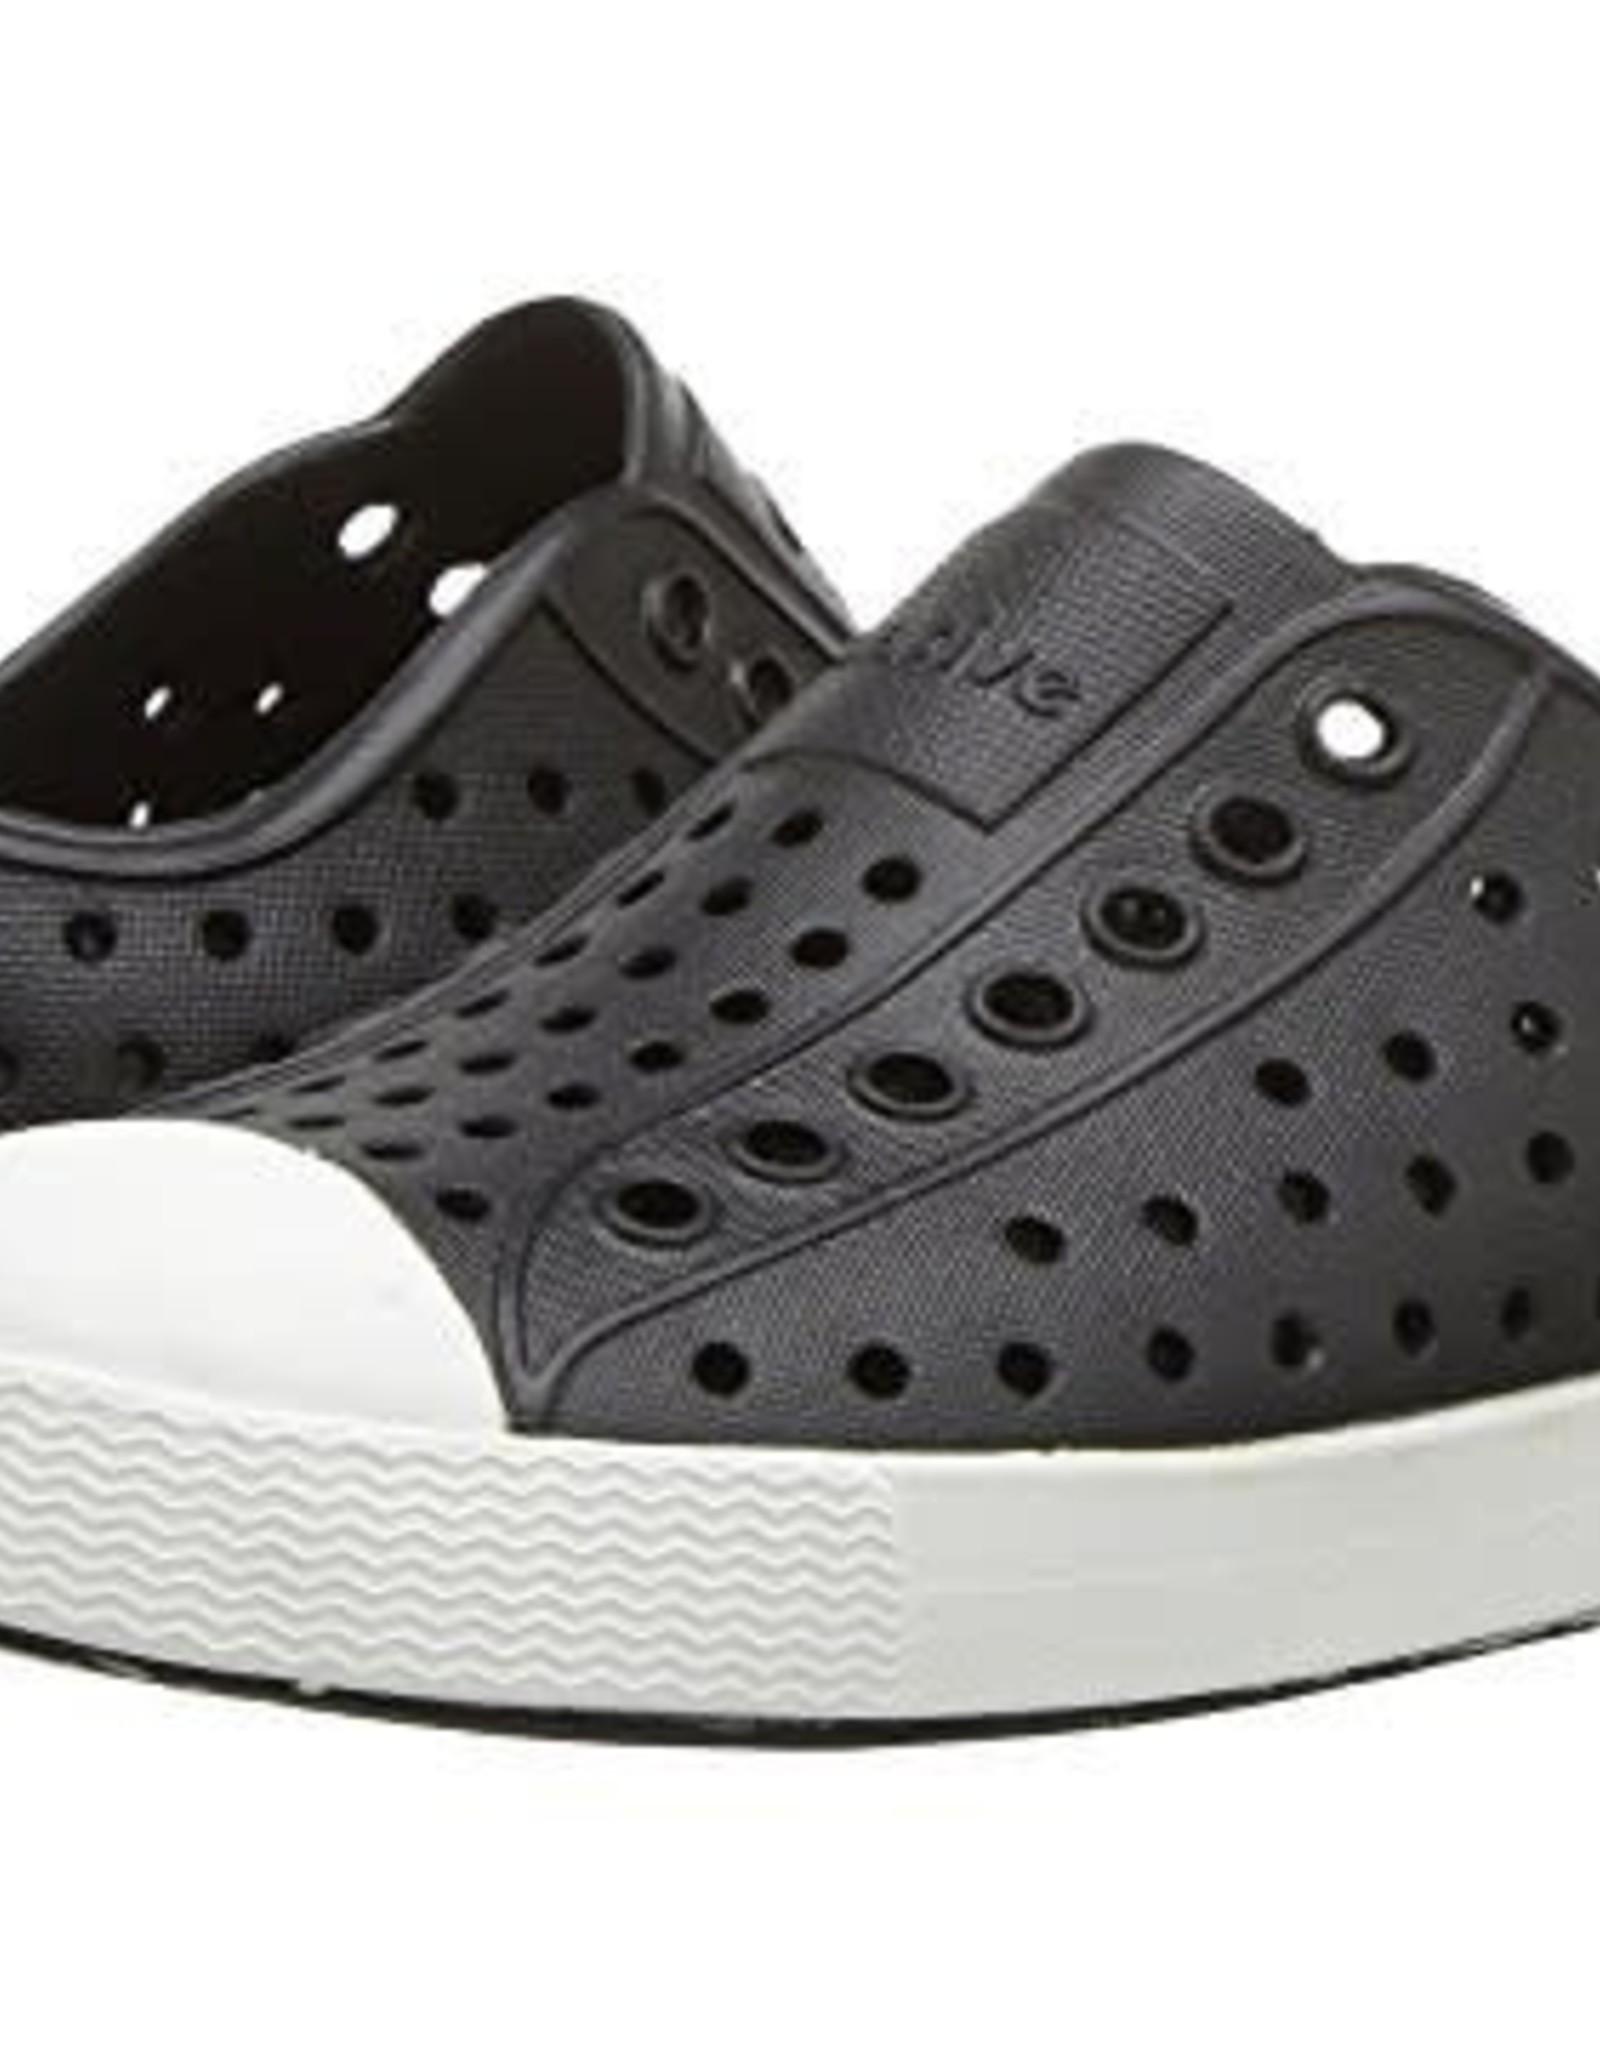 Native Shoes Jefferson in Jiffy Black